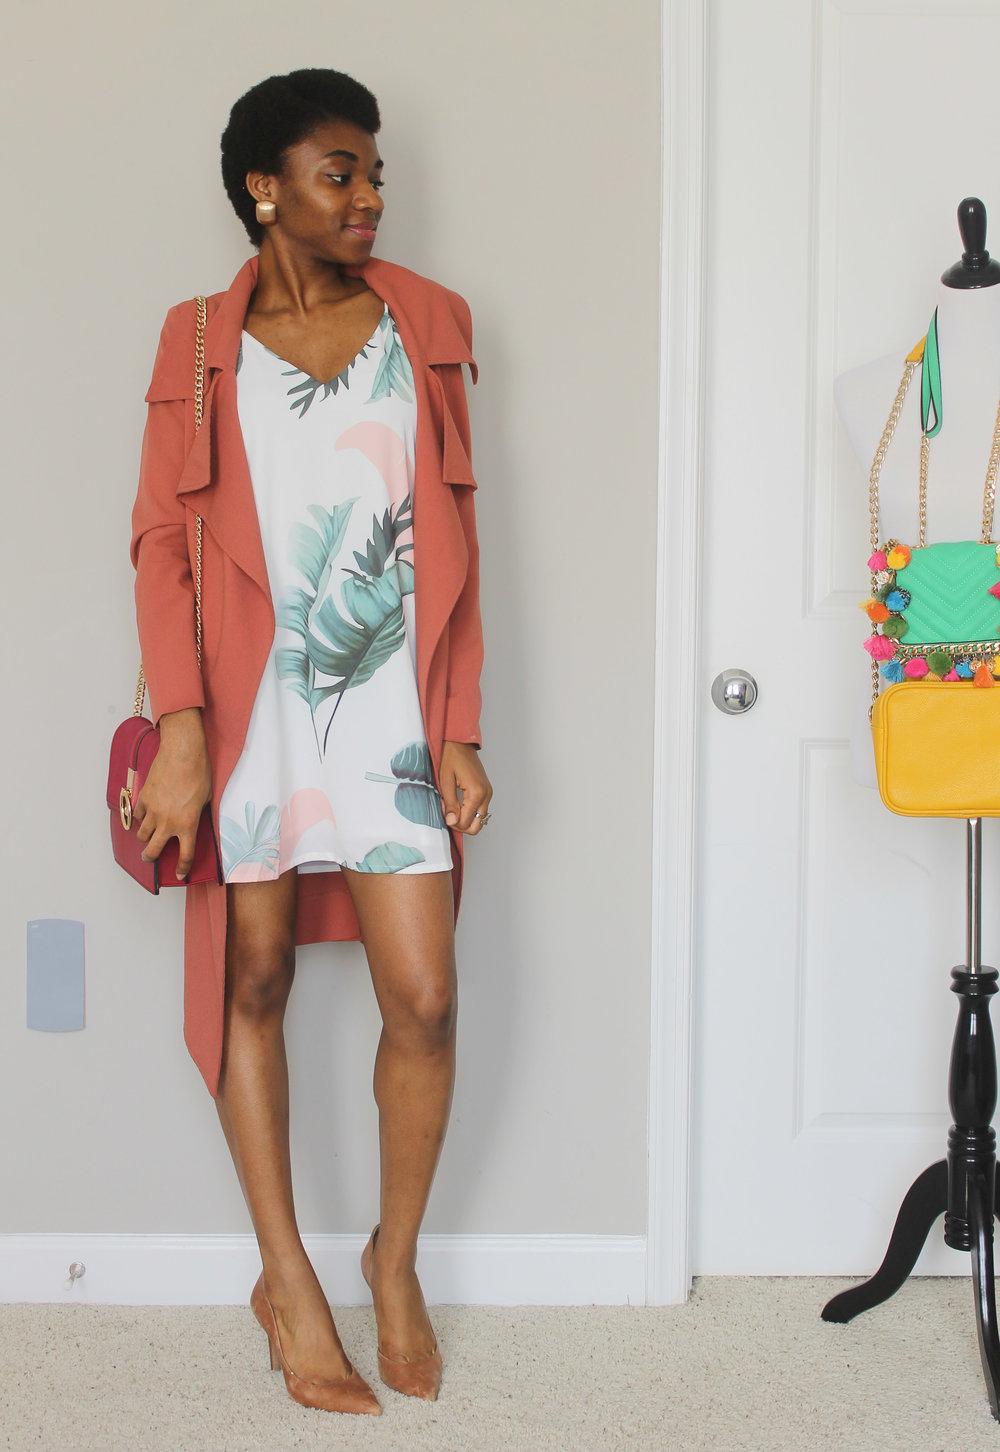 4WaystoWear-tropical-prints-dress 21.jpg